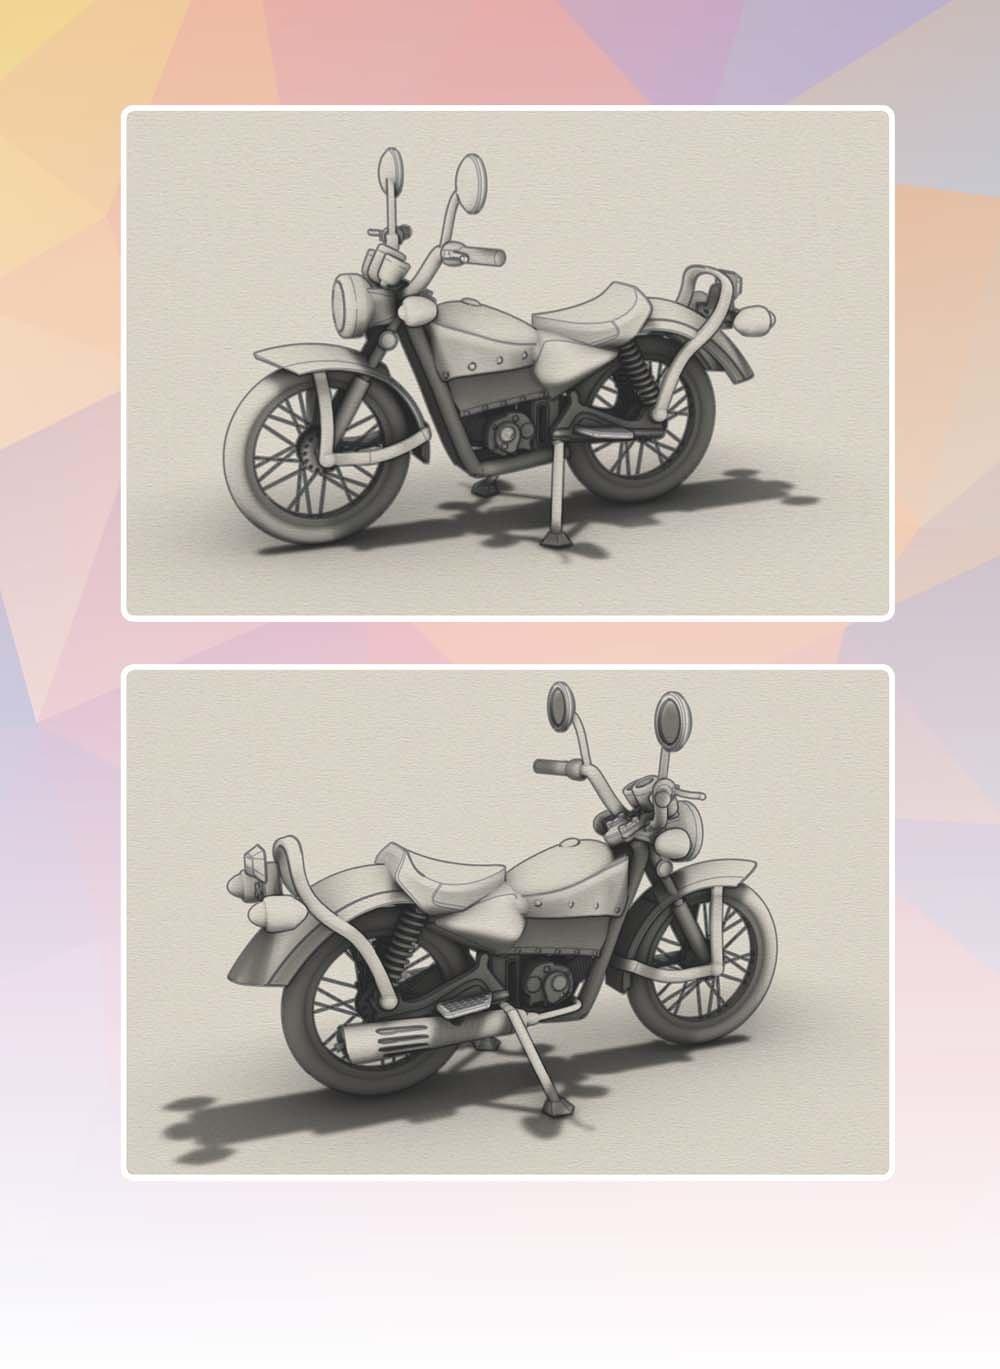 Rhinoceros 6 全攻略:自學設計與 3D建模寶典-preview-10